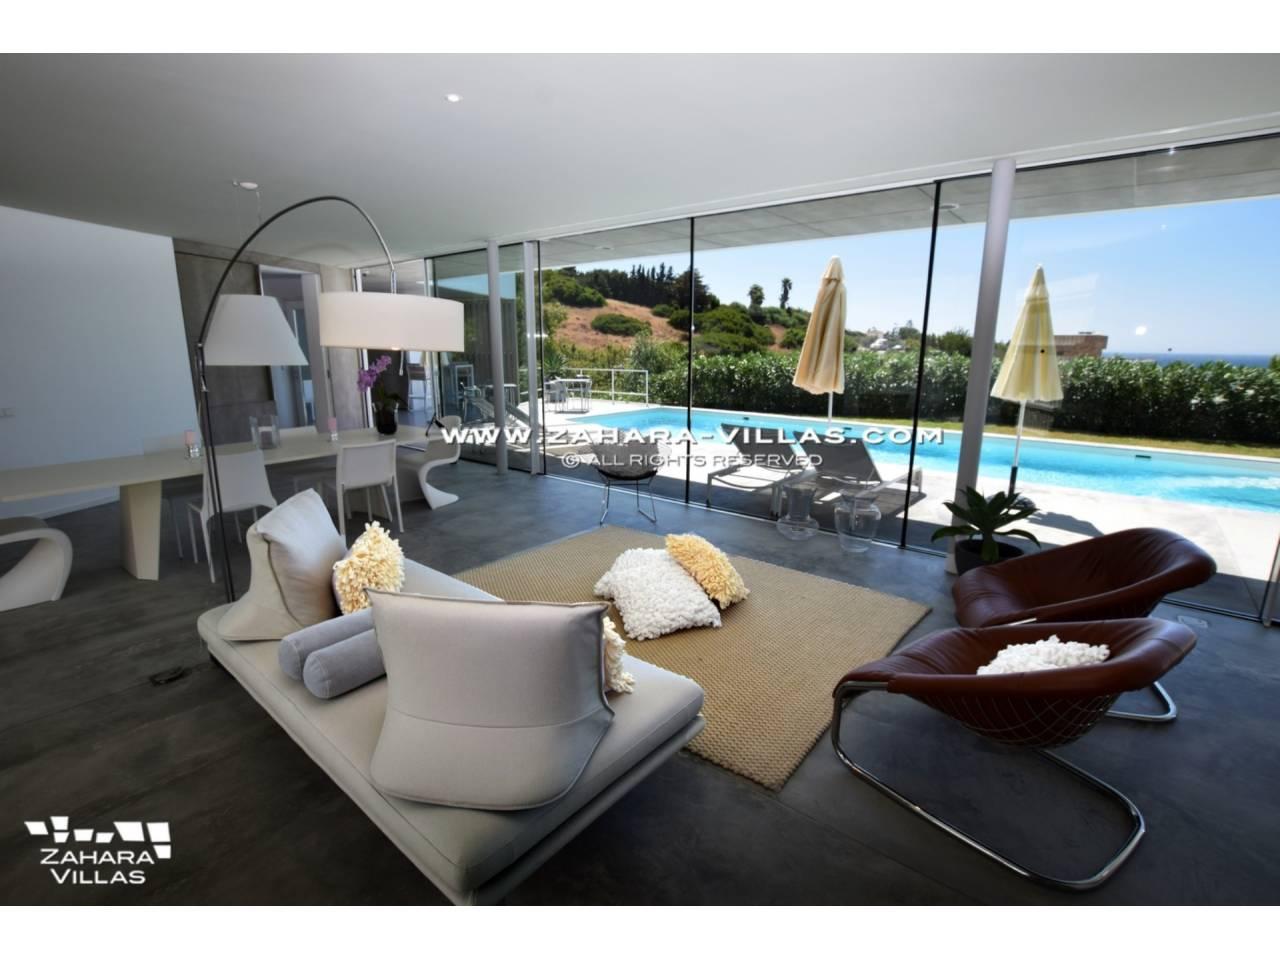 Imagen 3 de Villa zum verkauf in Atlanterra